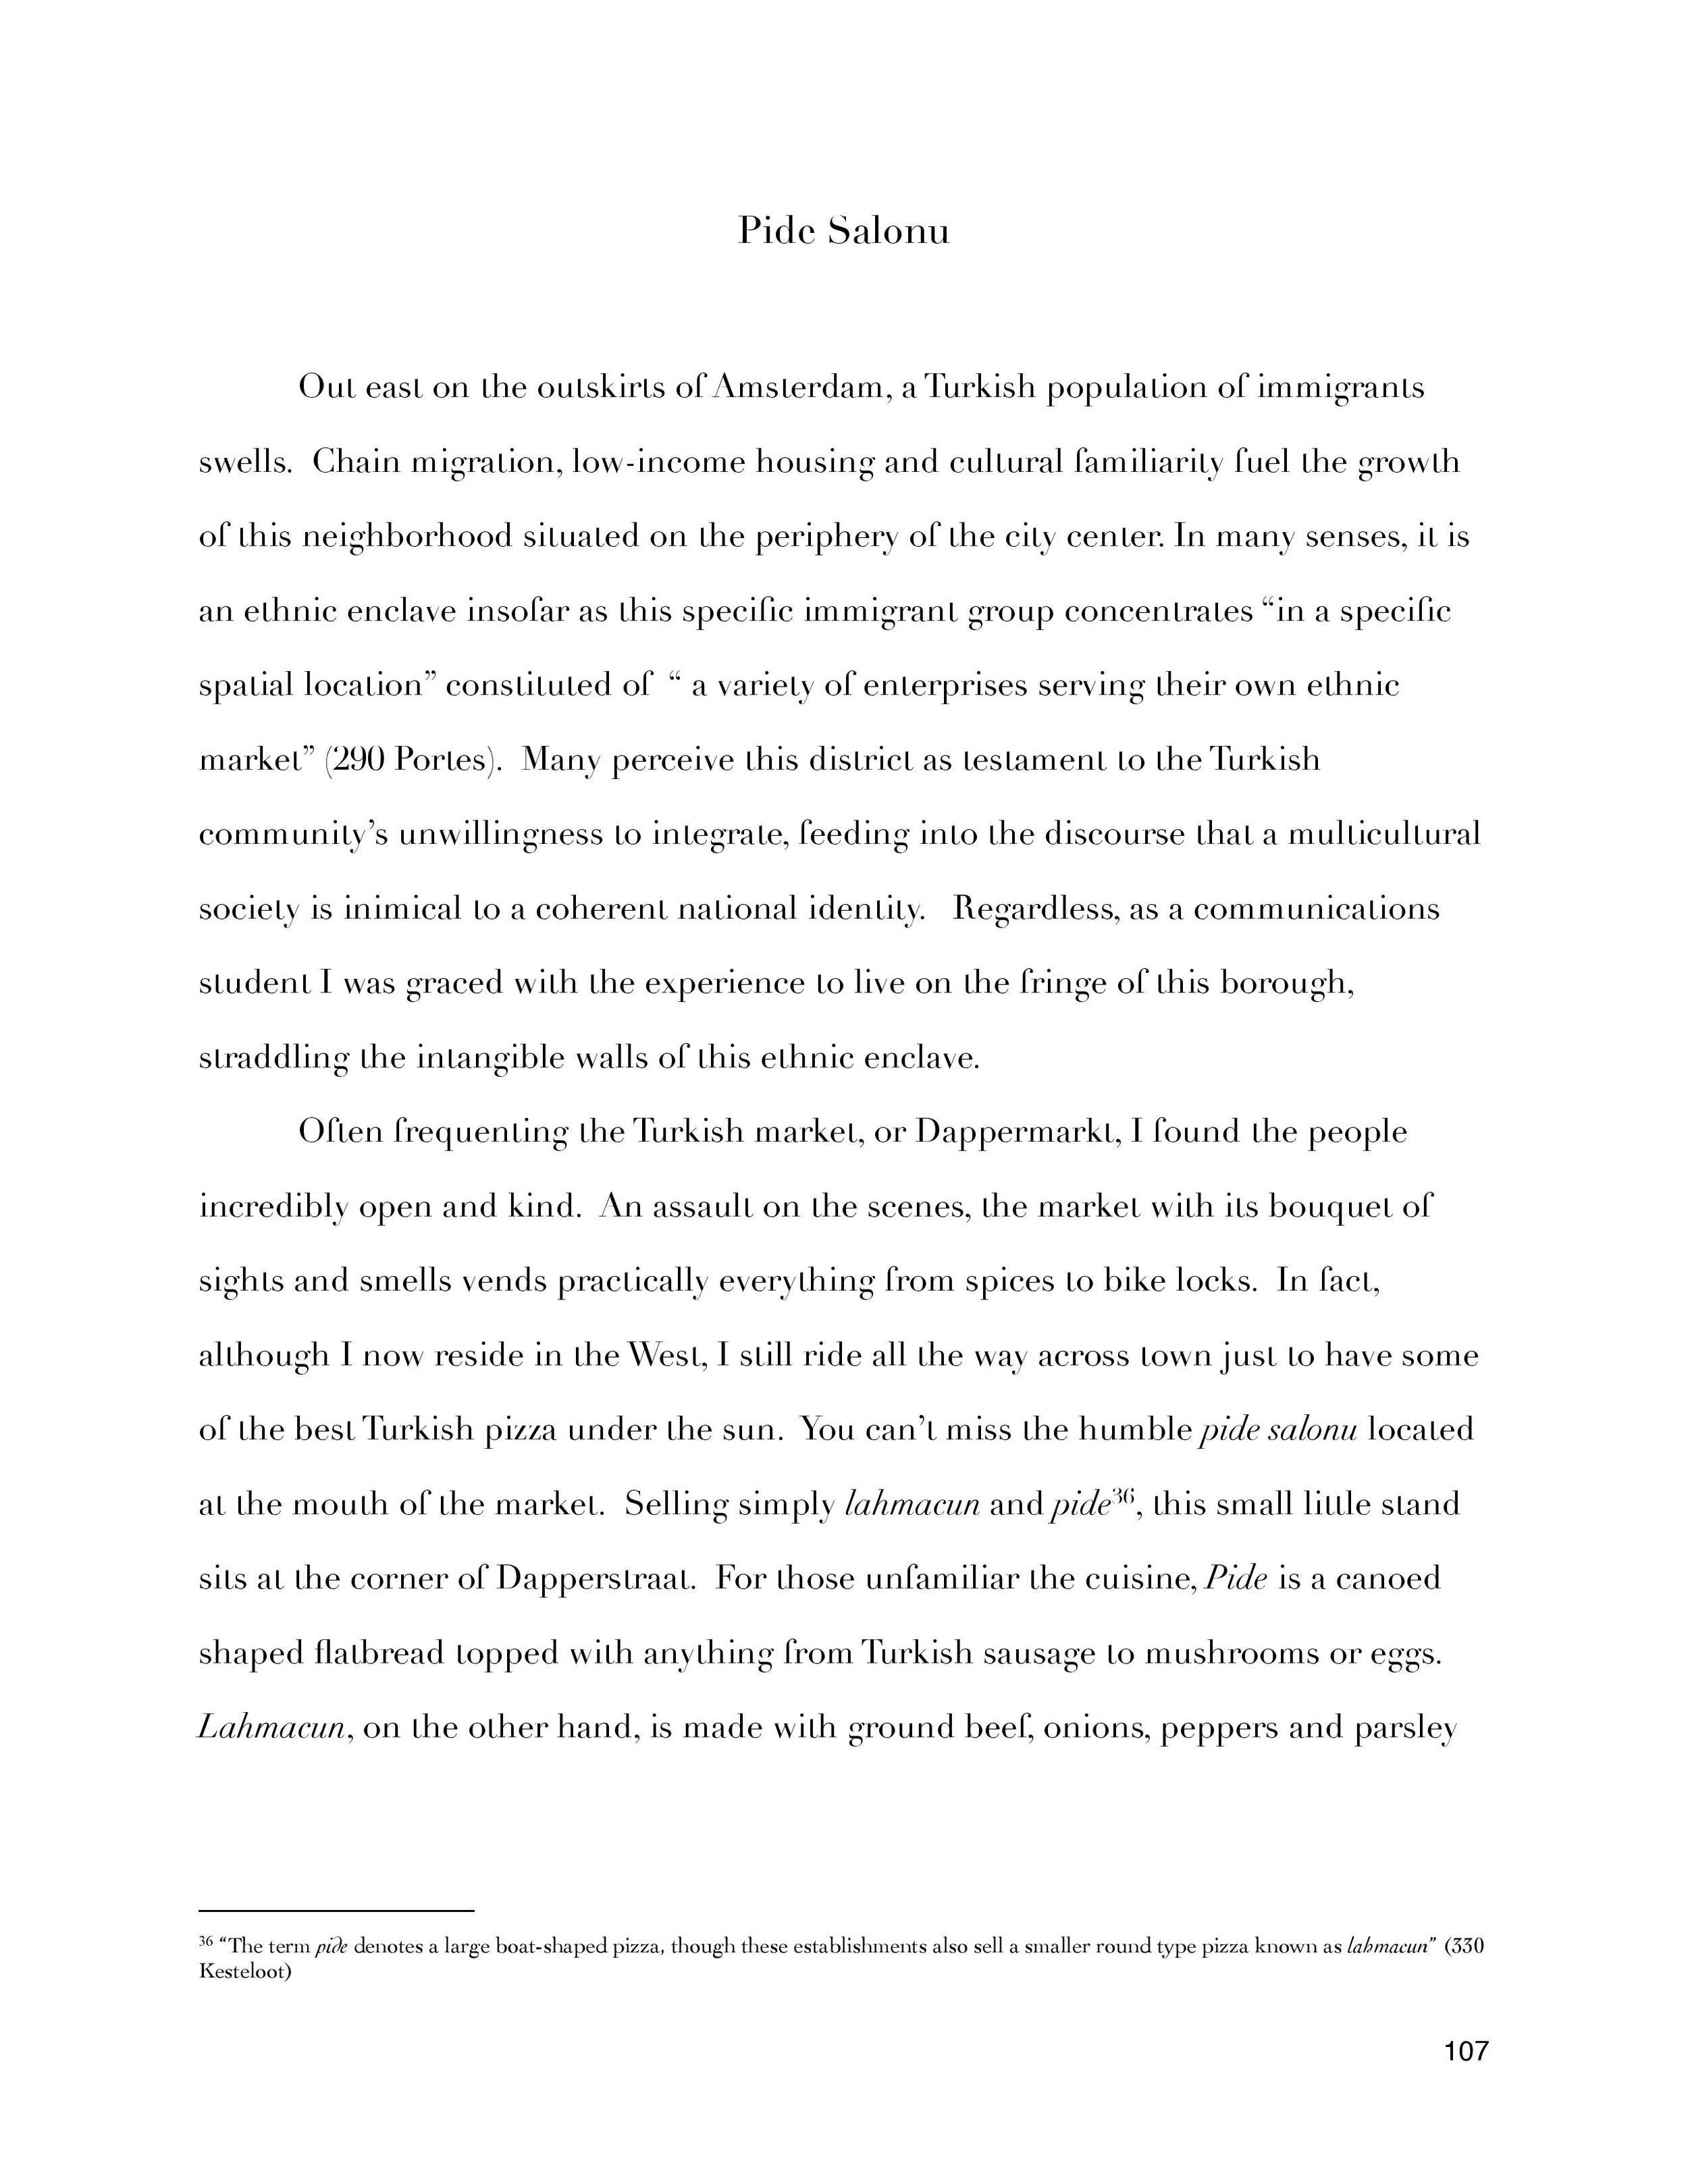 ShatteredGlass-page-108.jpg